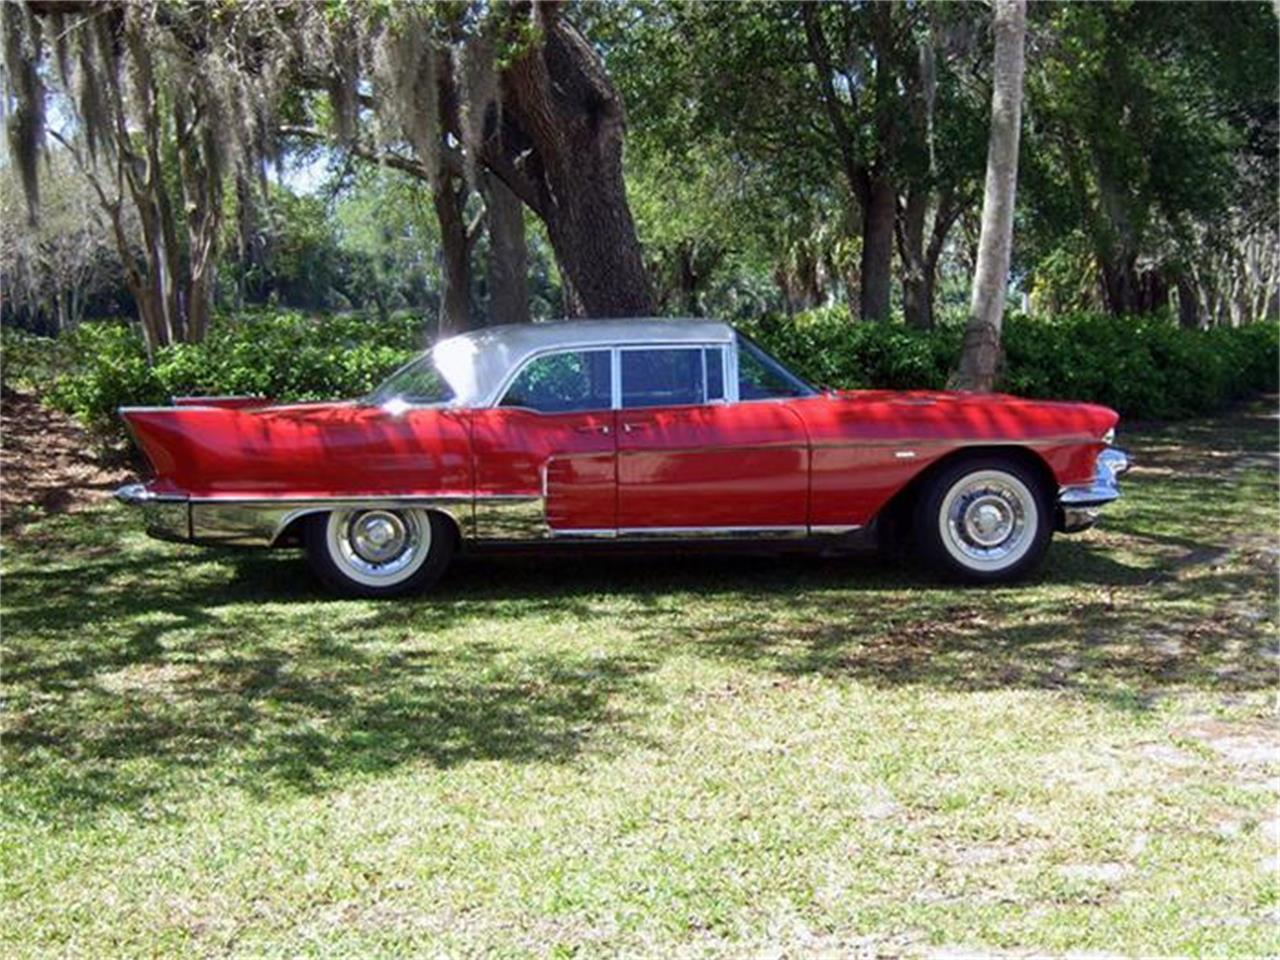 Large Picture of '58 Cadillac Eldorado Brougham located in Florida - $169,900.00 - B3EW